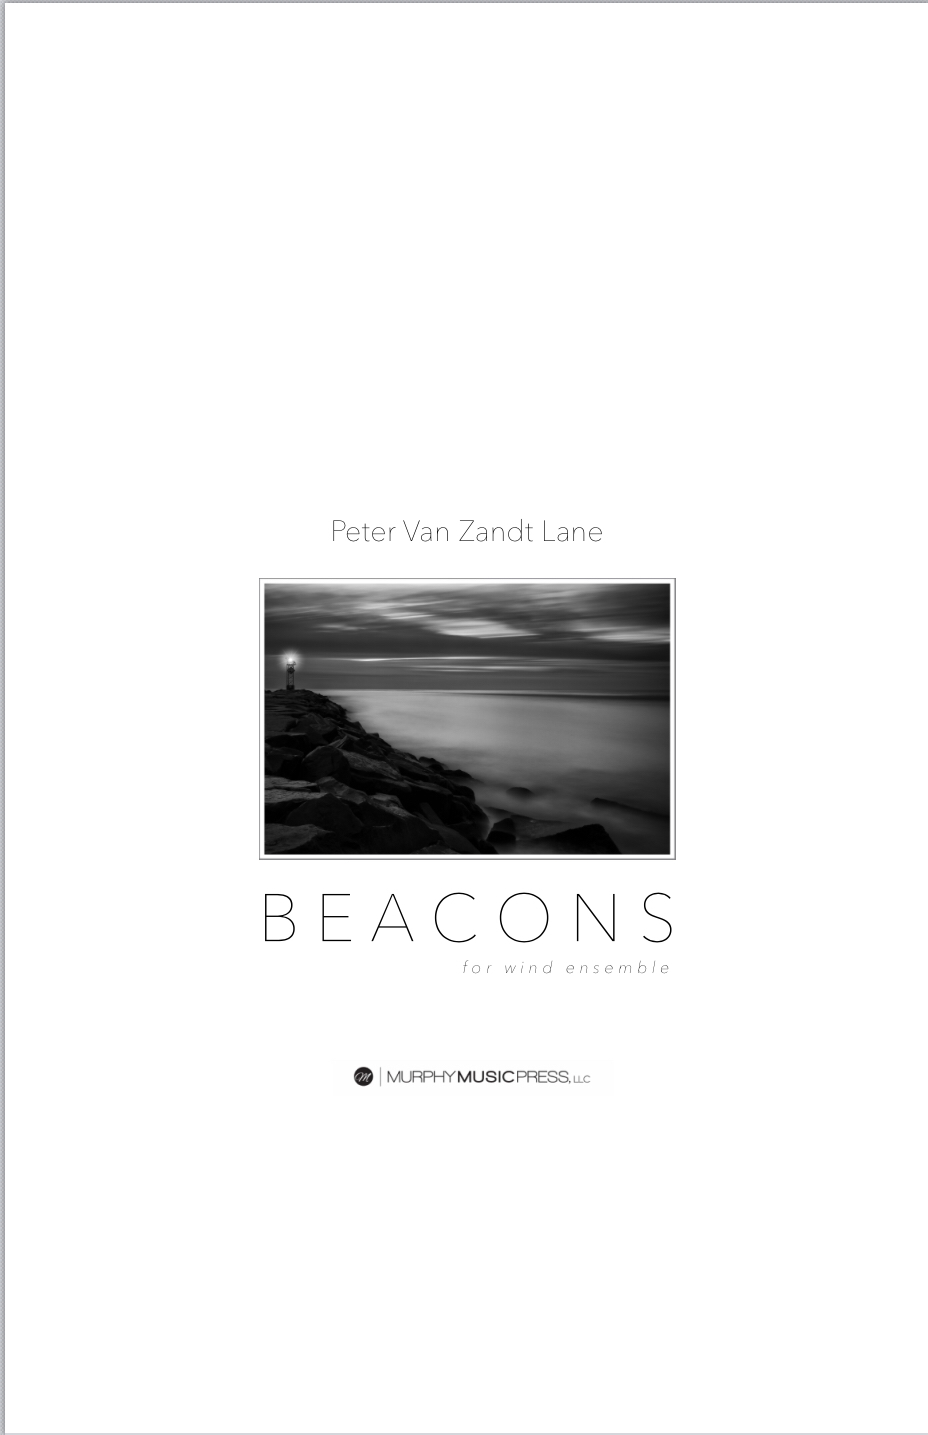 Beacons (parts Rental Only) by Peter Van Zandt Lane